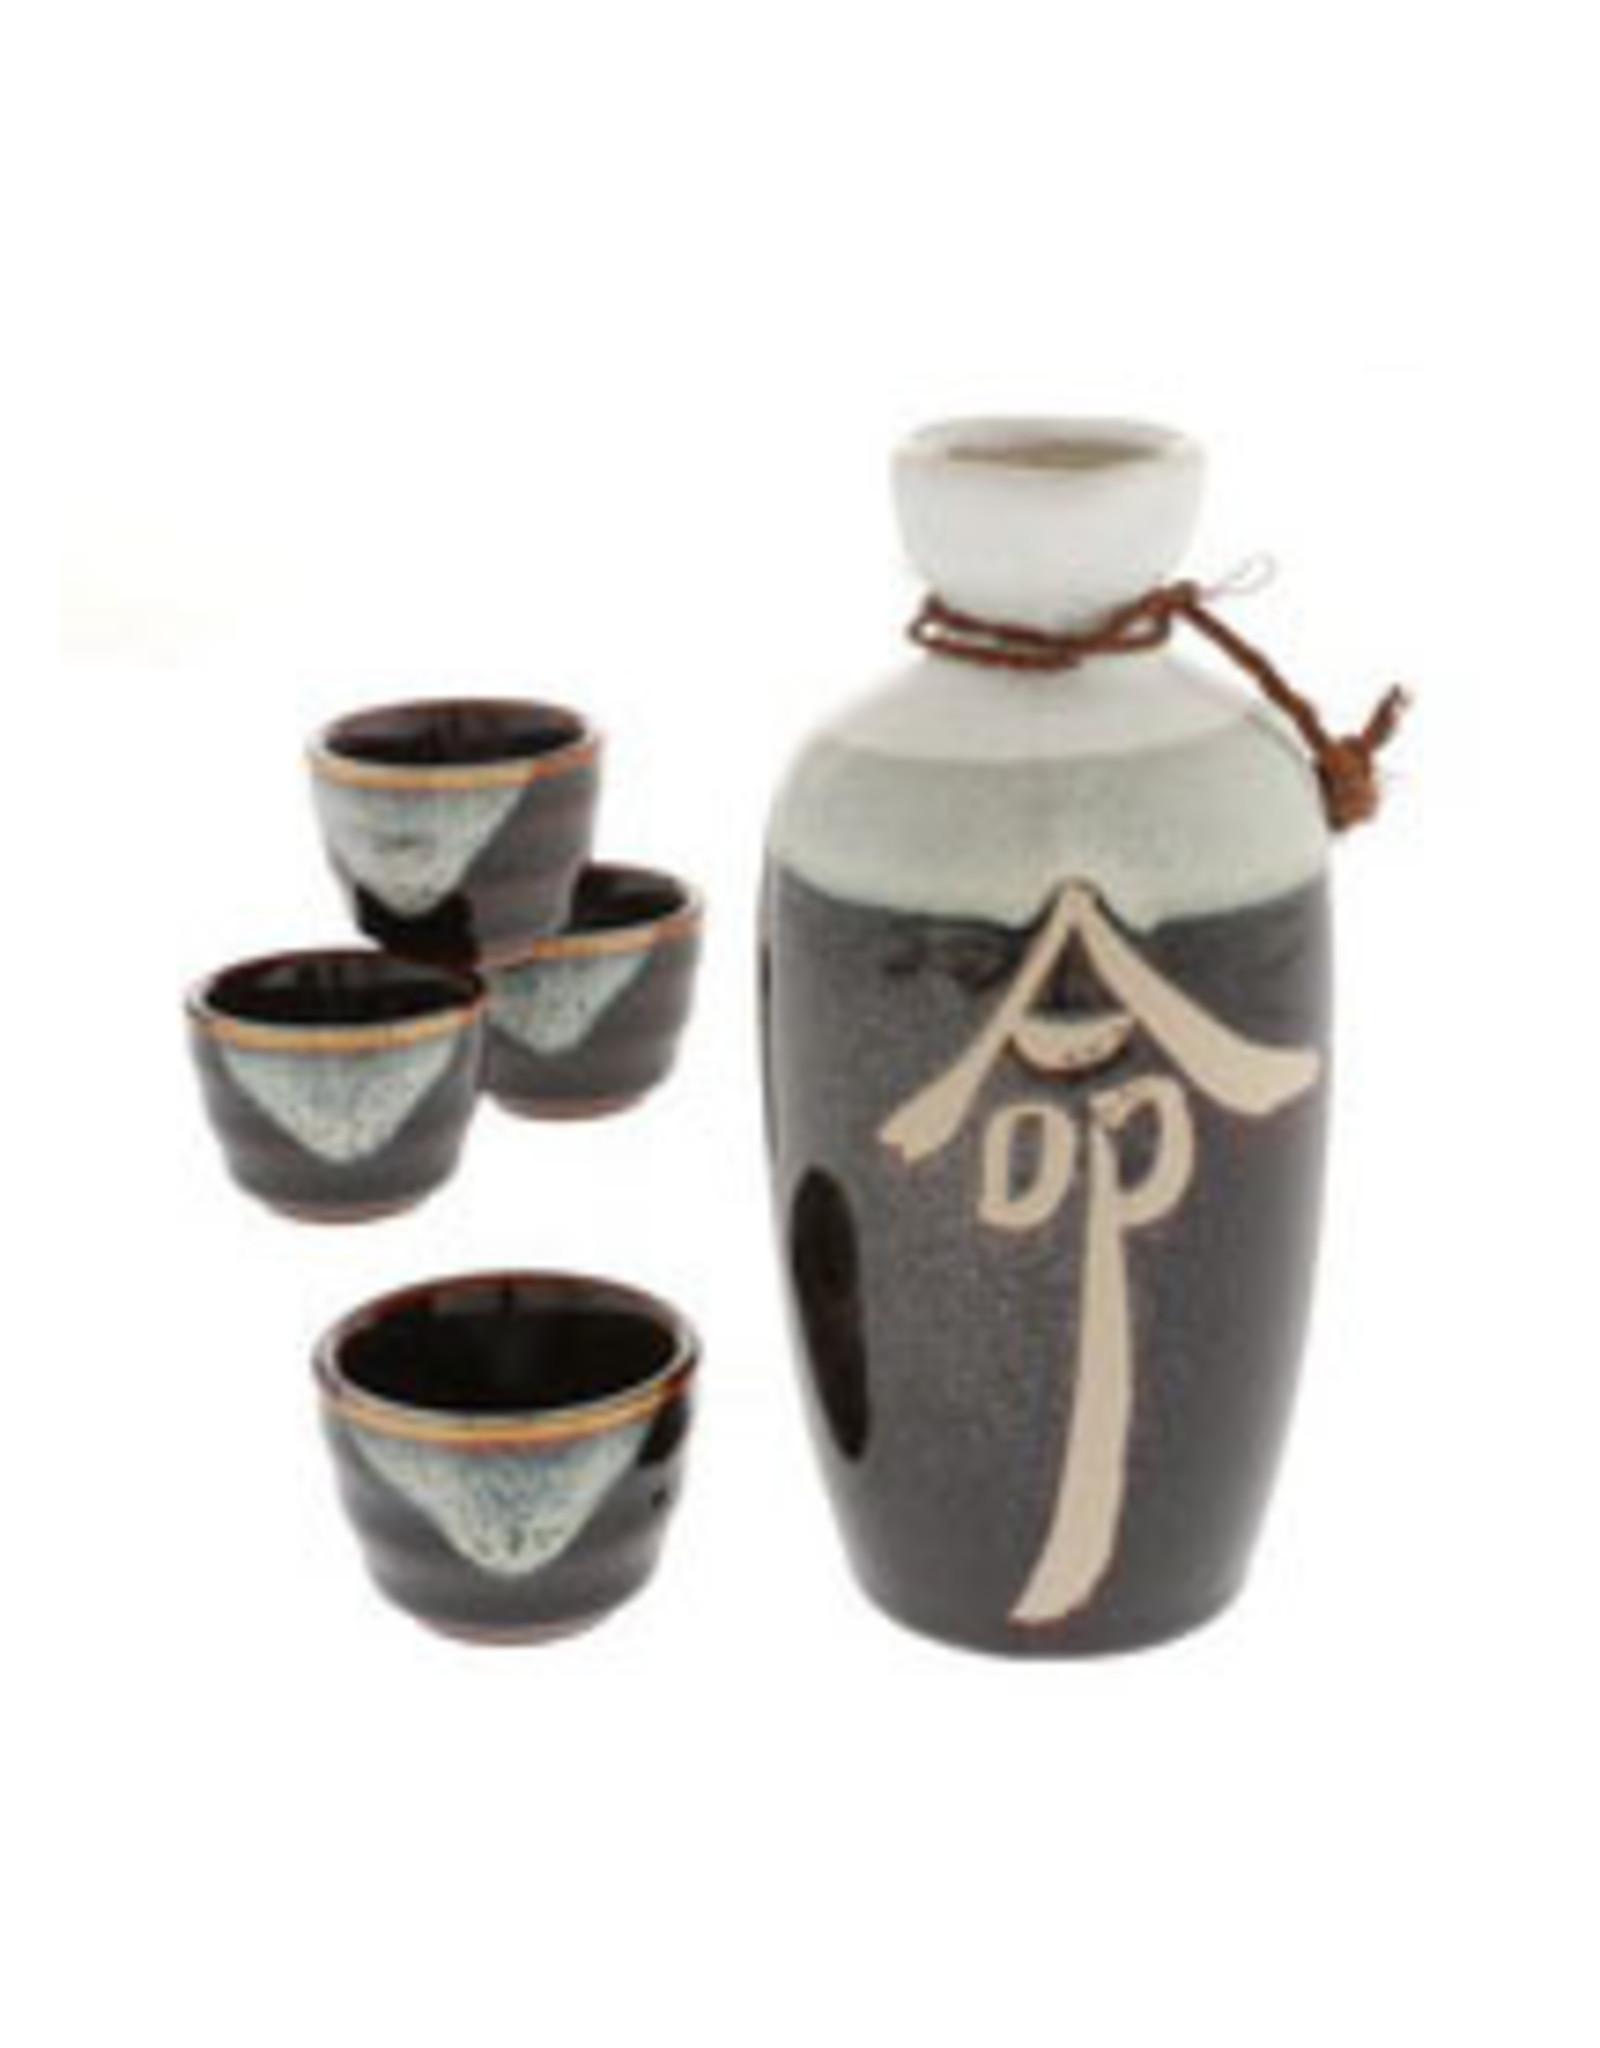 Tenmoku/Shiro Long Life Sake Set of 4